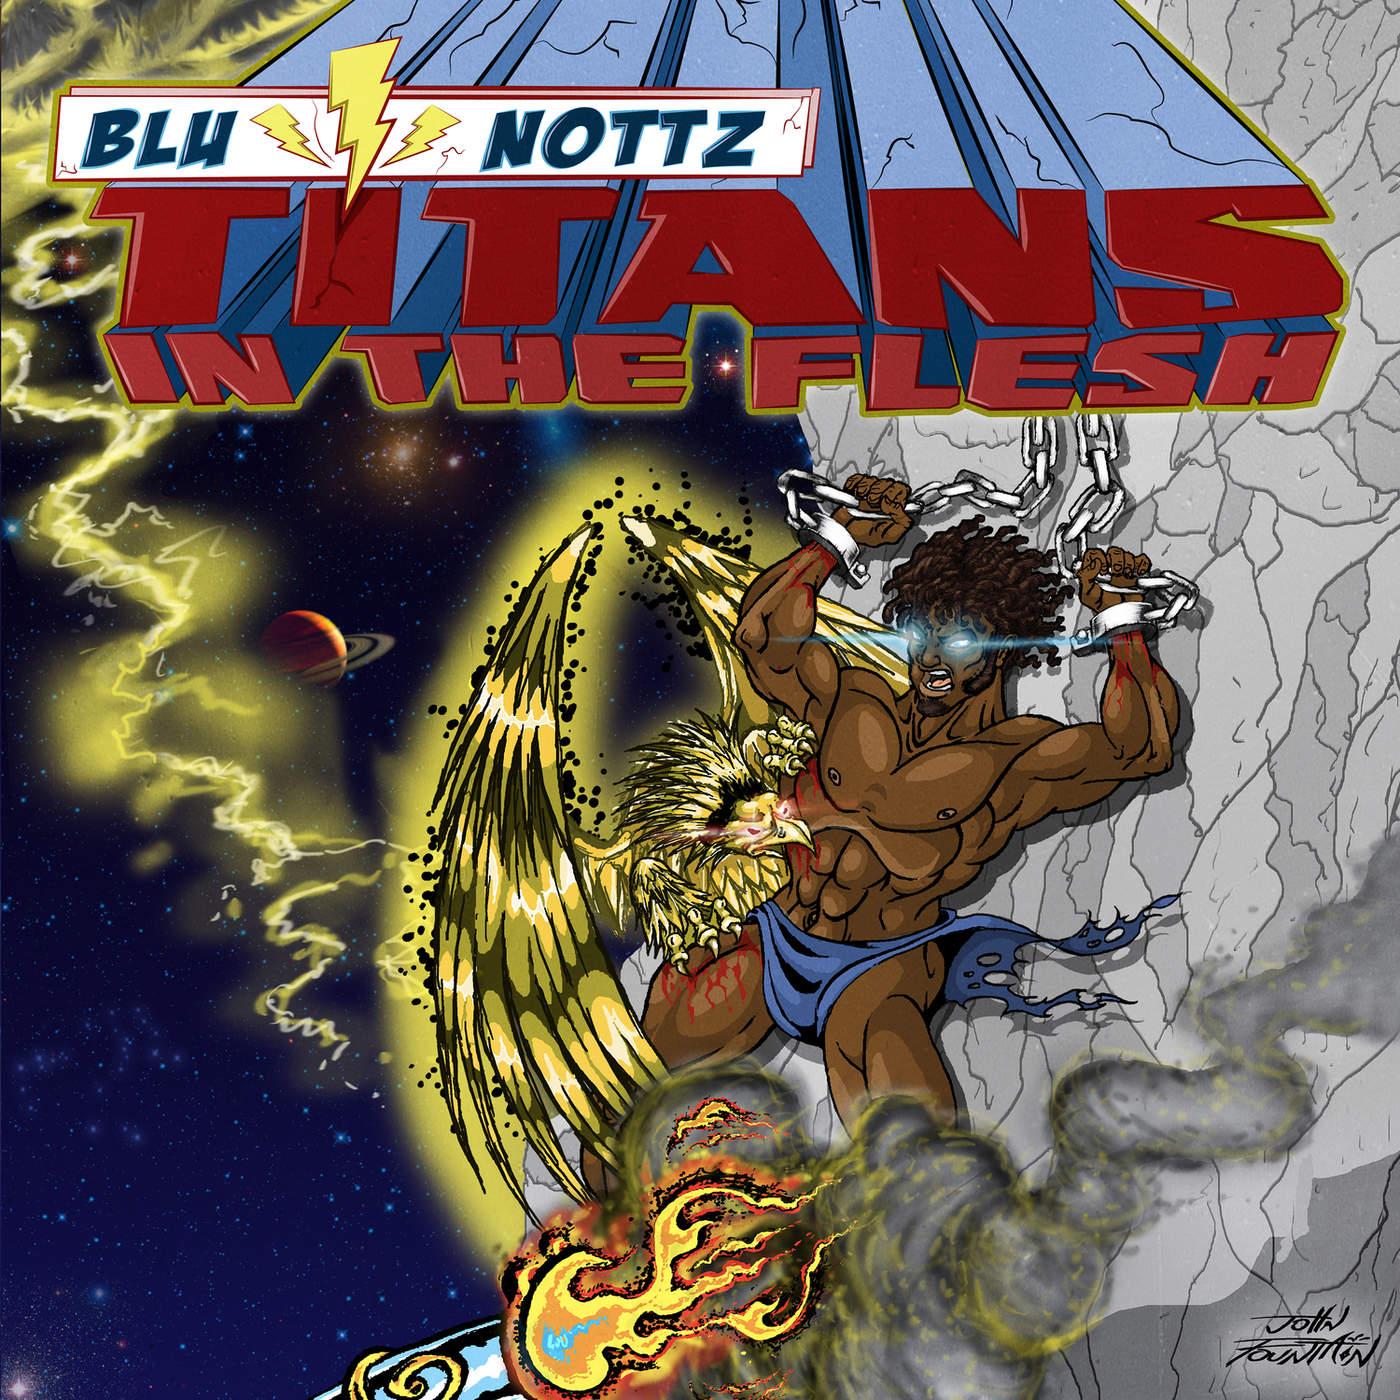 Blu & Nottz - Titans in the Flesh Cover